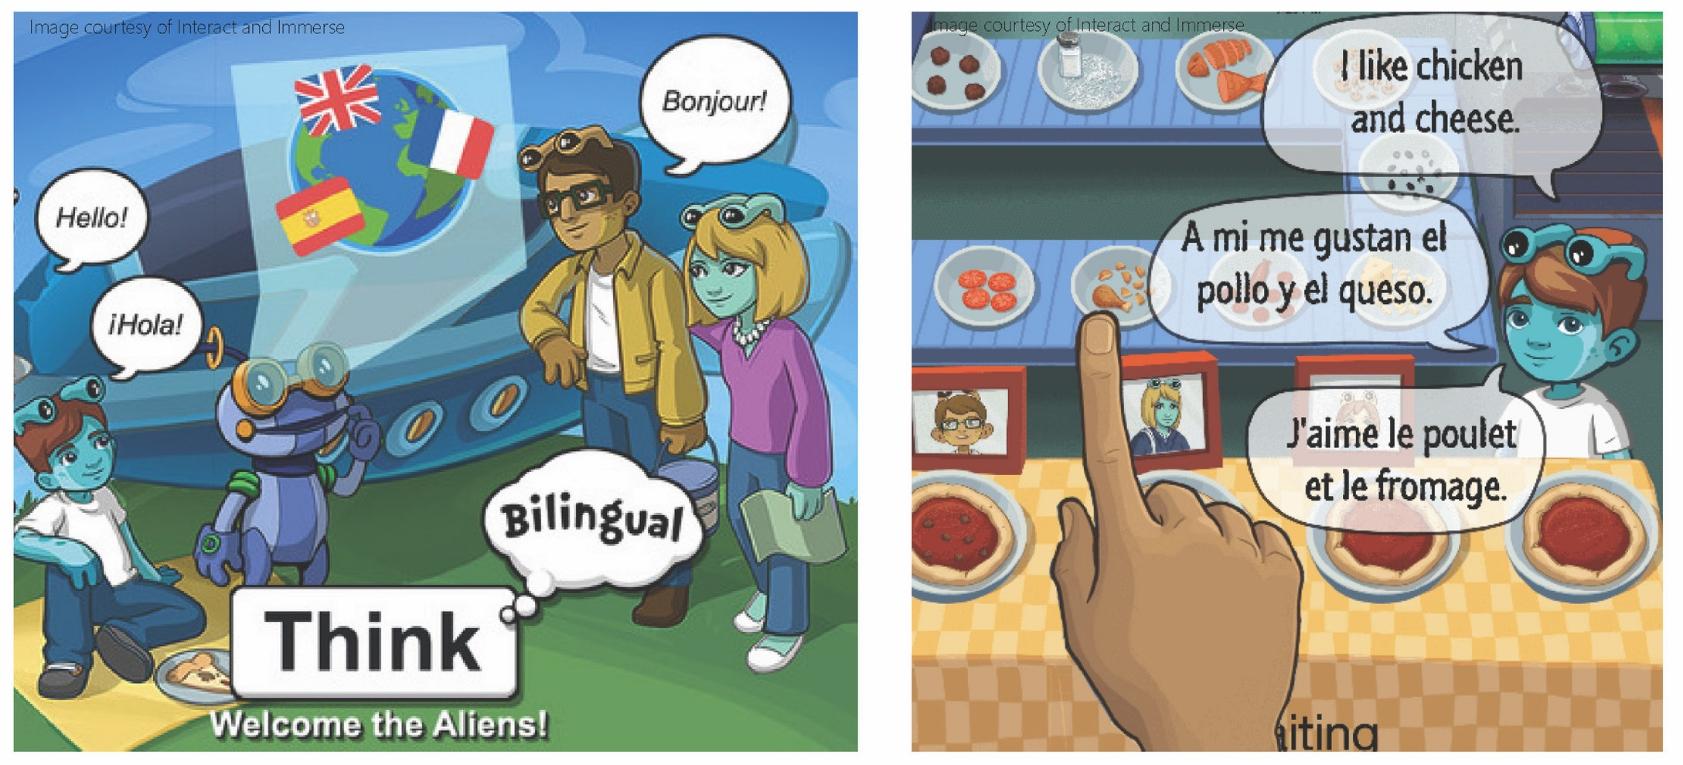 bilingual outlook-12 jobs